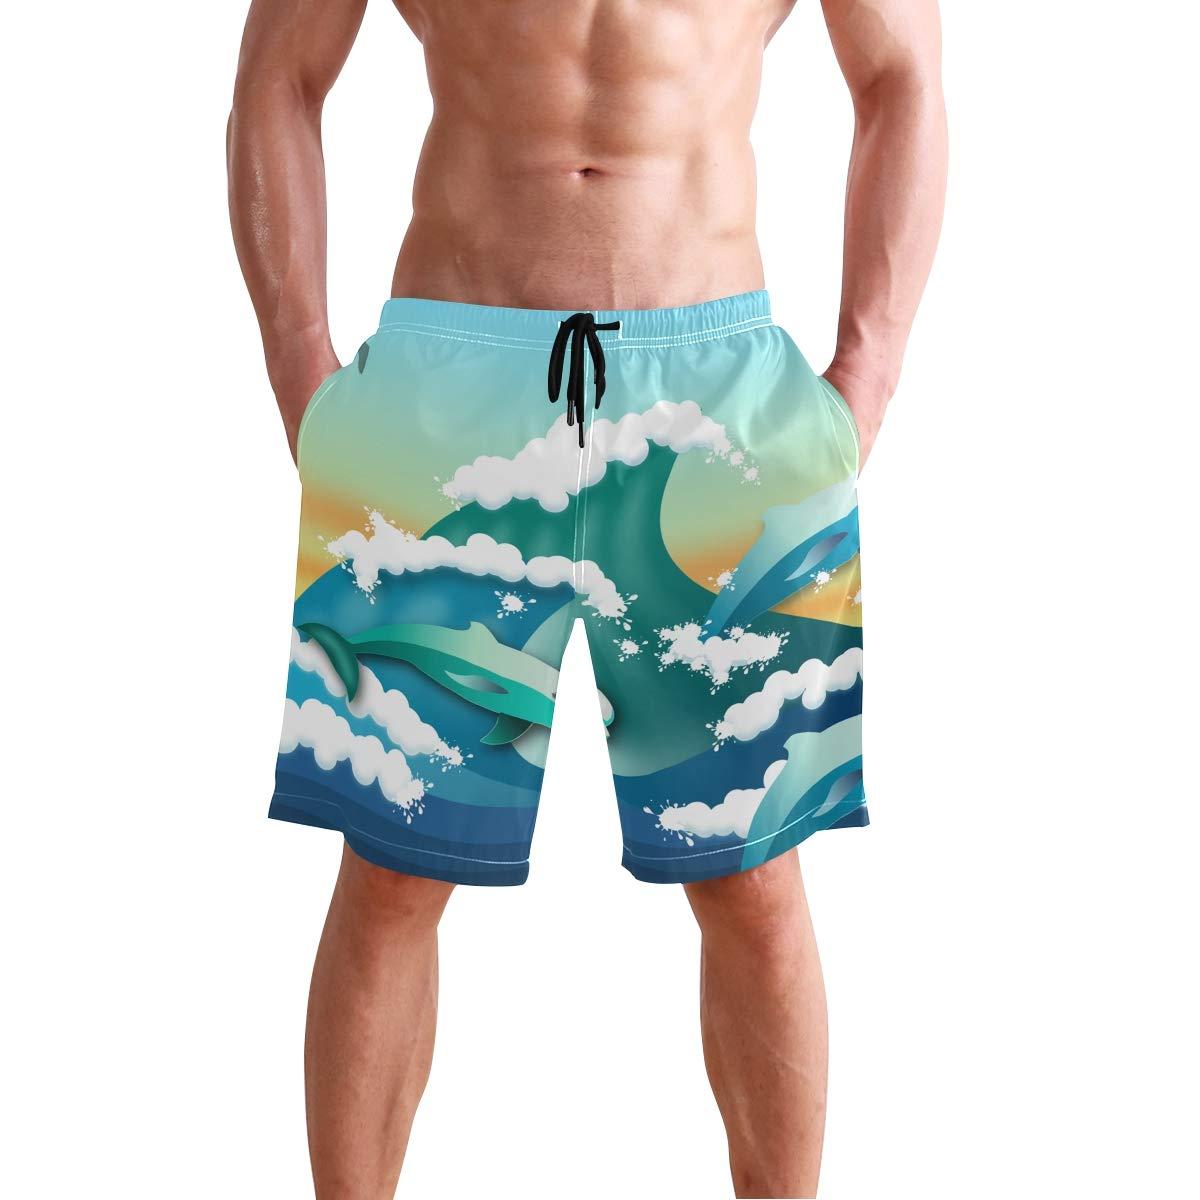 Mens Swim Trunks Seagull Dolphins Ocean Wave Spindrift Beach Board Shorts